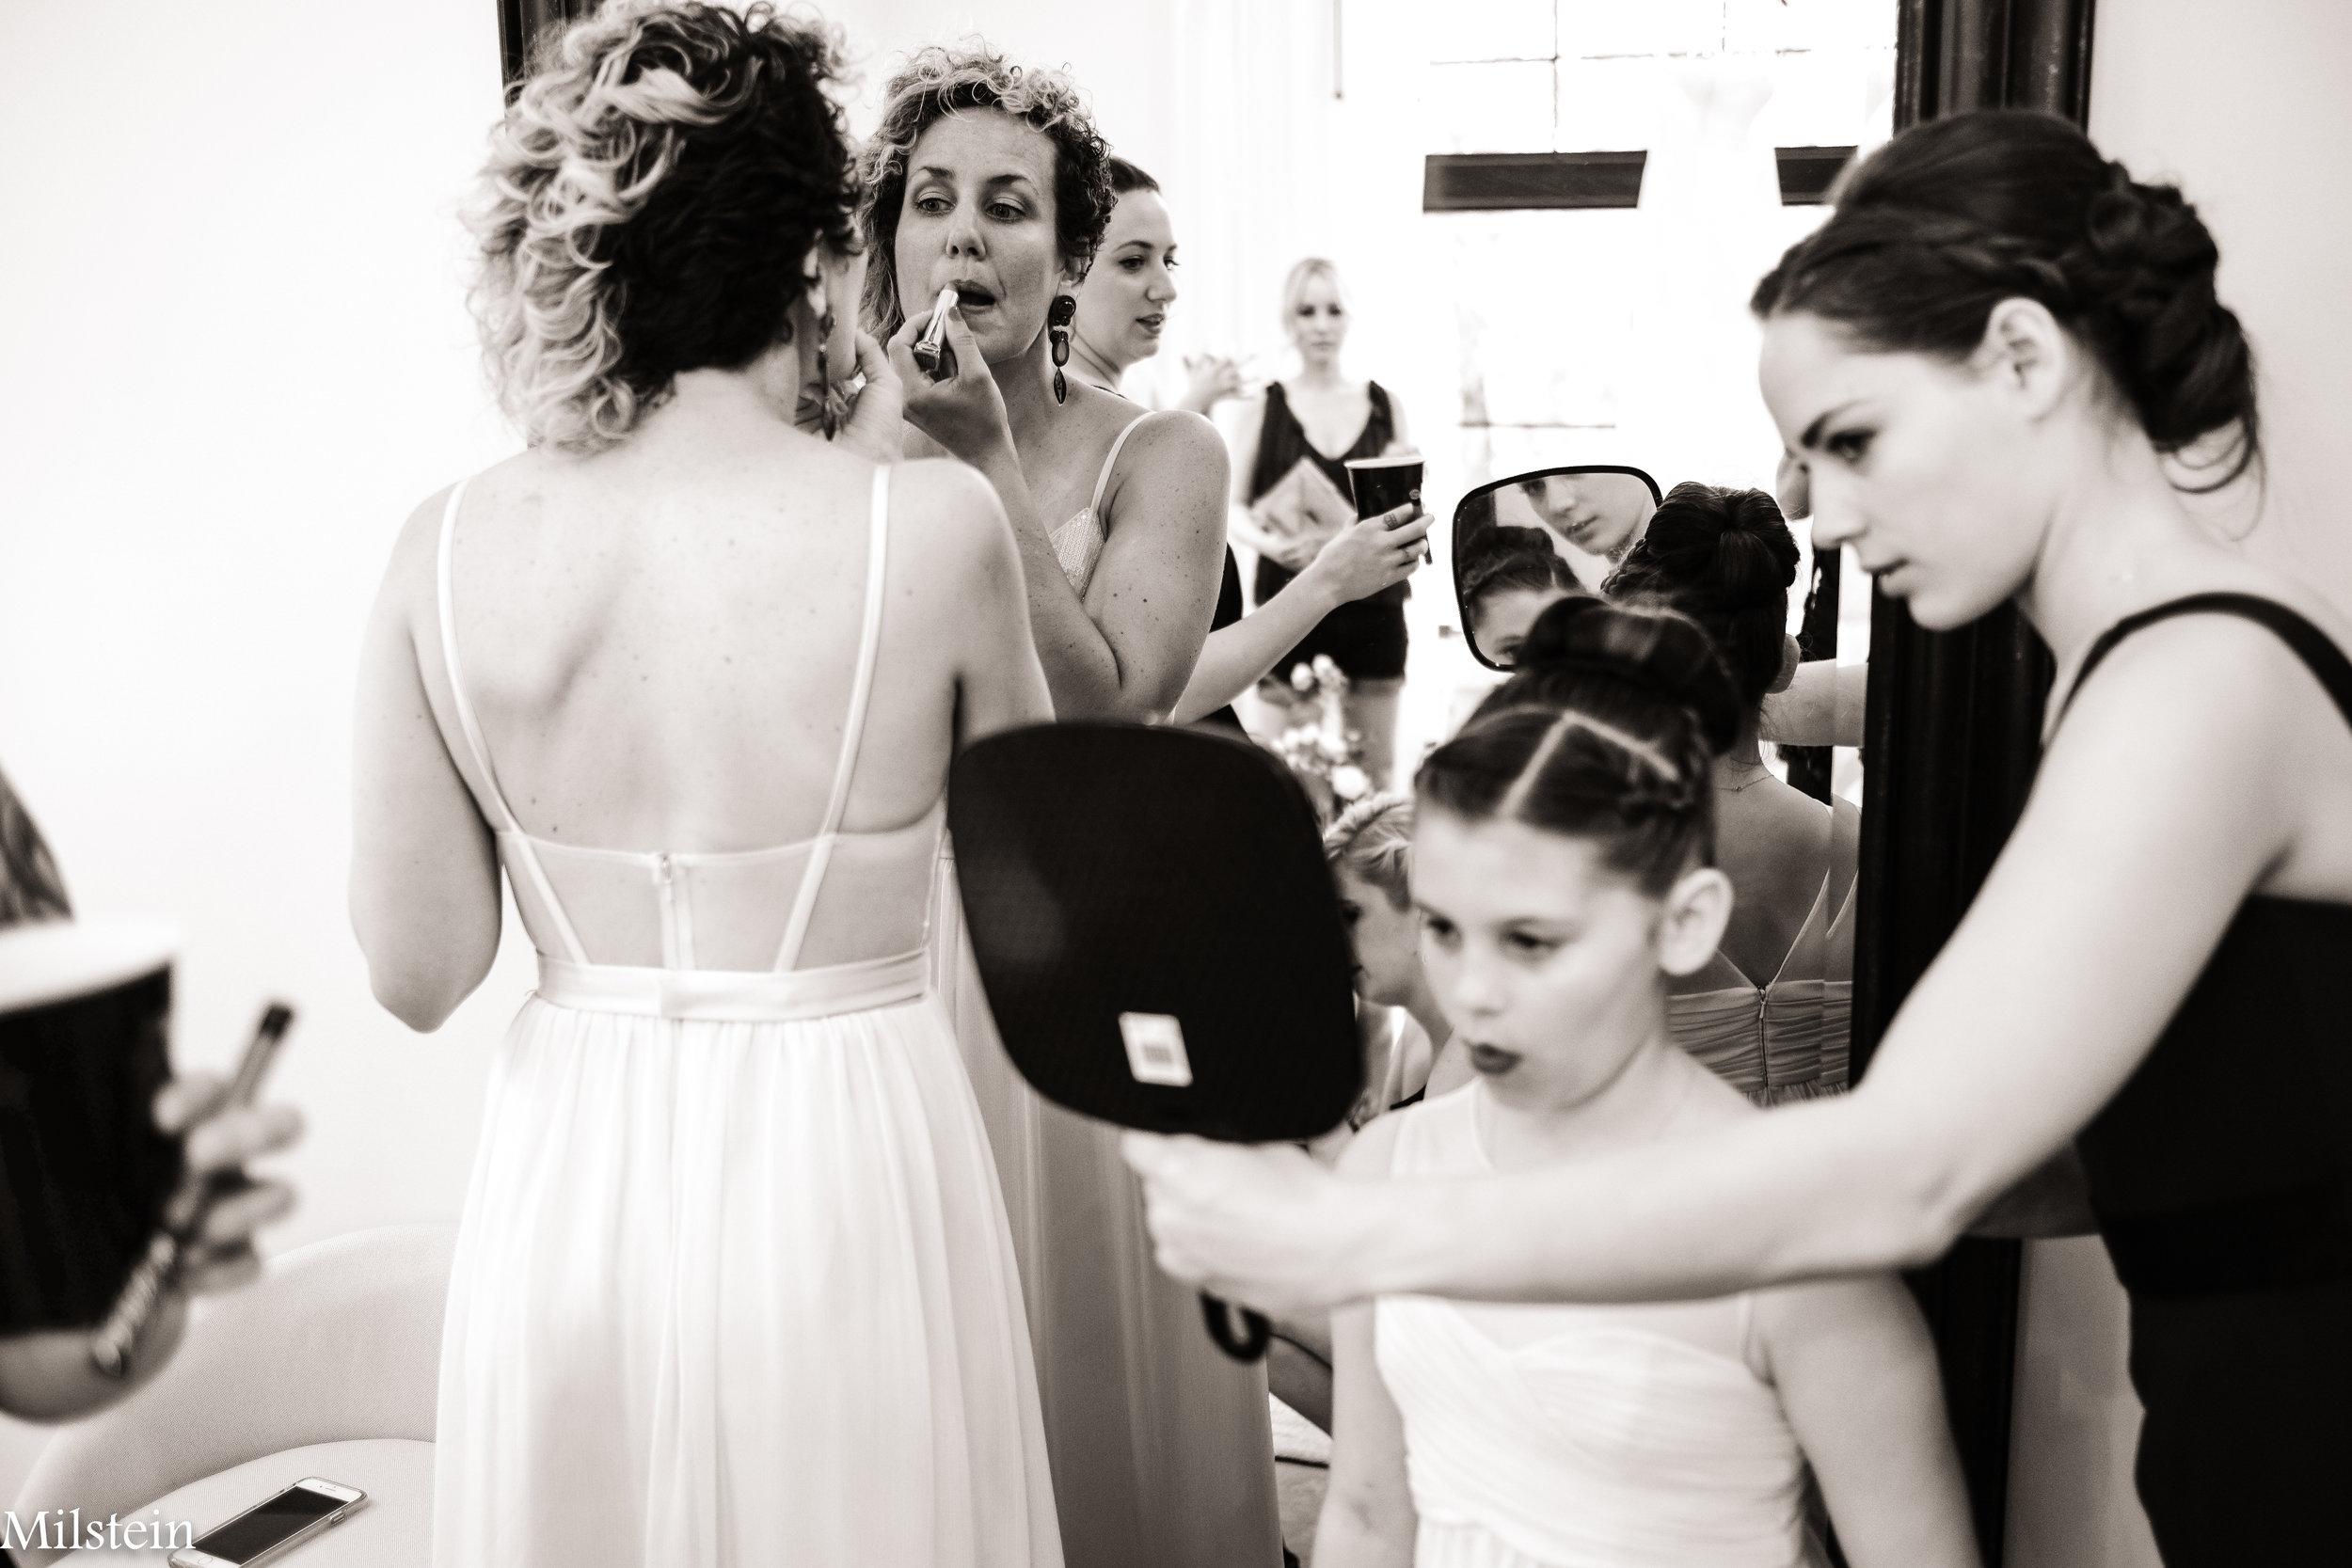 Wilds-Wedding-Venue-Amy-Milstein-Wedding-Photographer-NYC